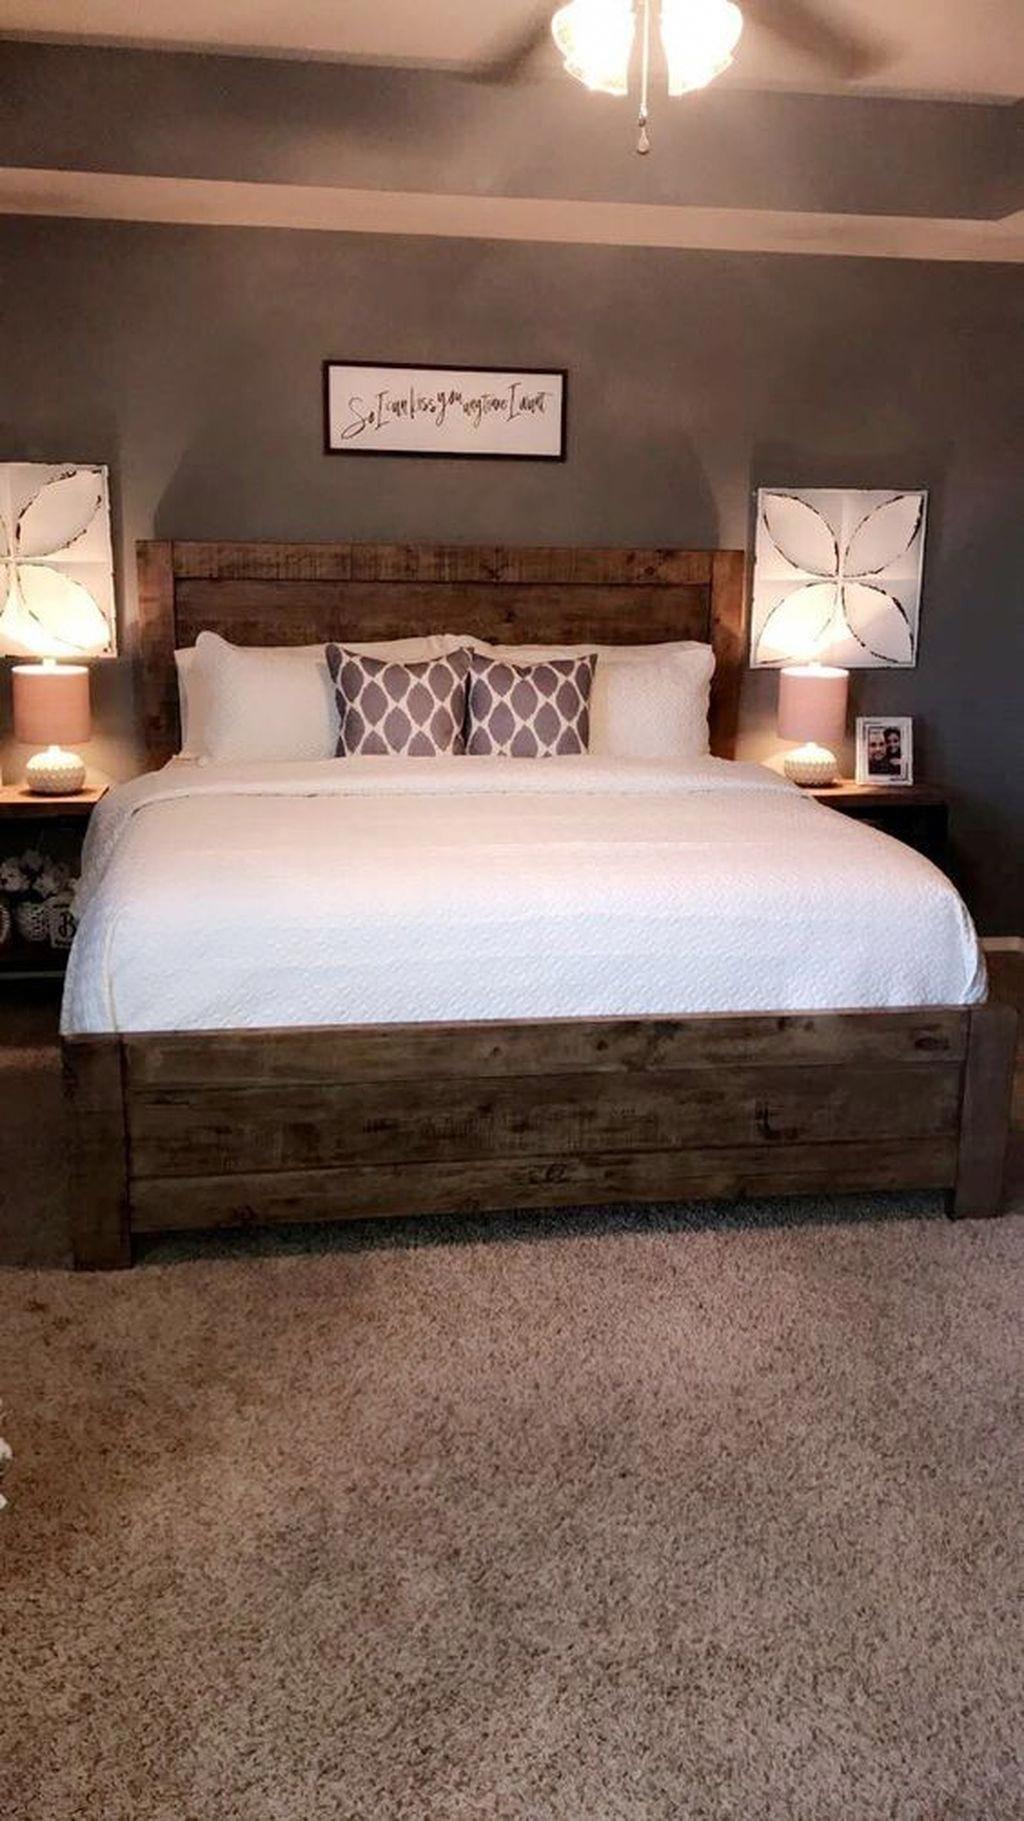 46 The Best Bedroom Decor Ideas With Farmhouse Style